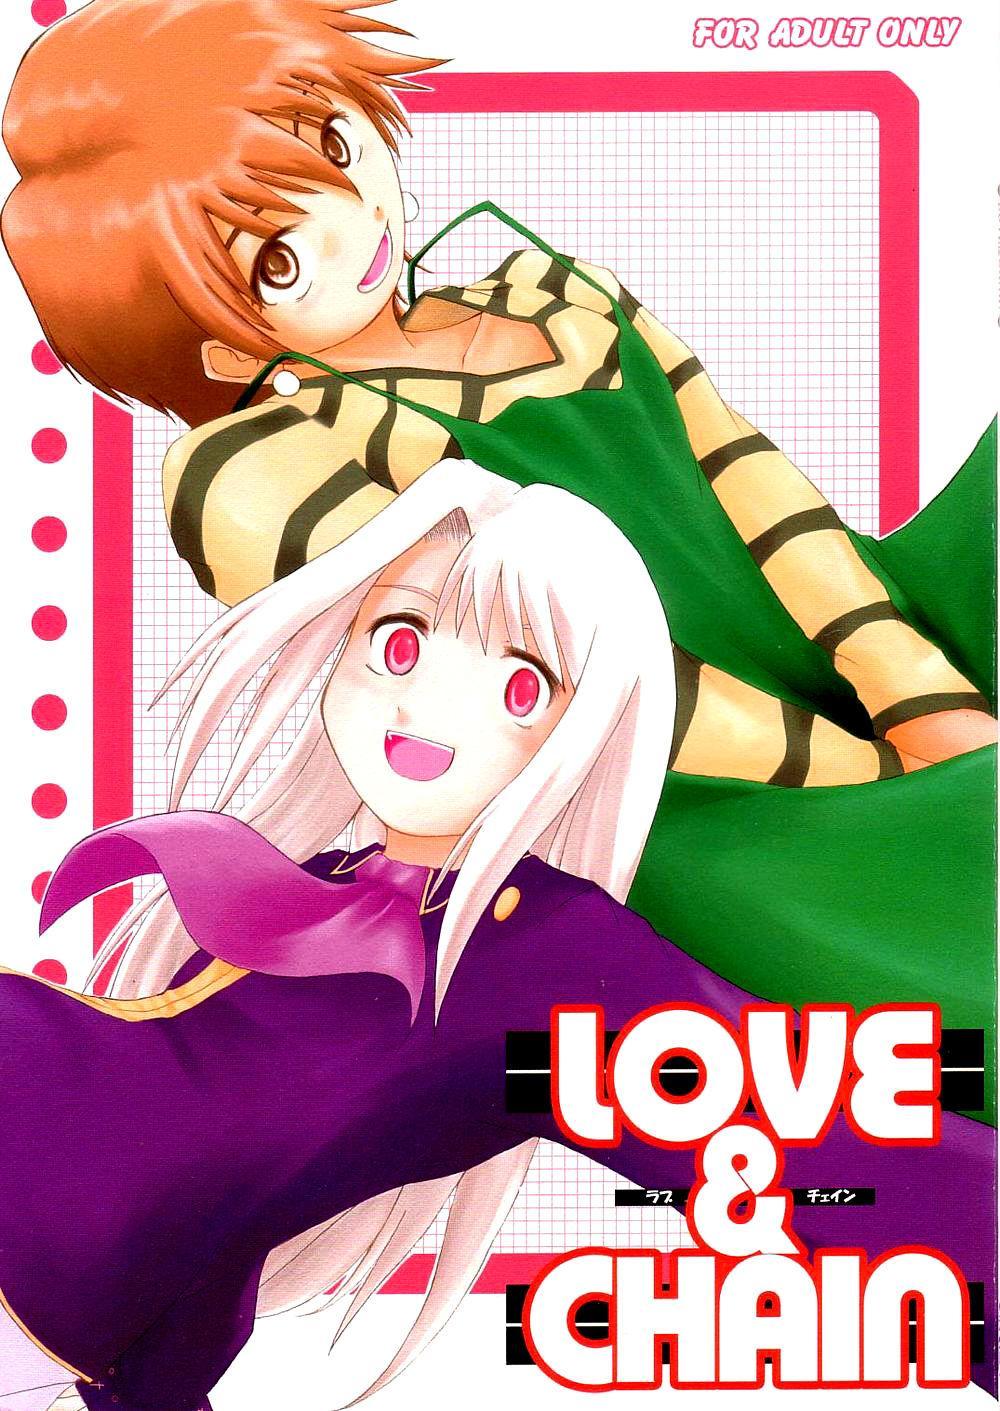 LOVE & CHAIN 0